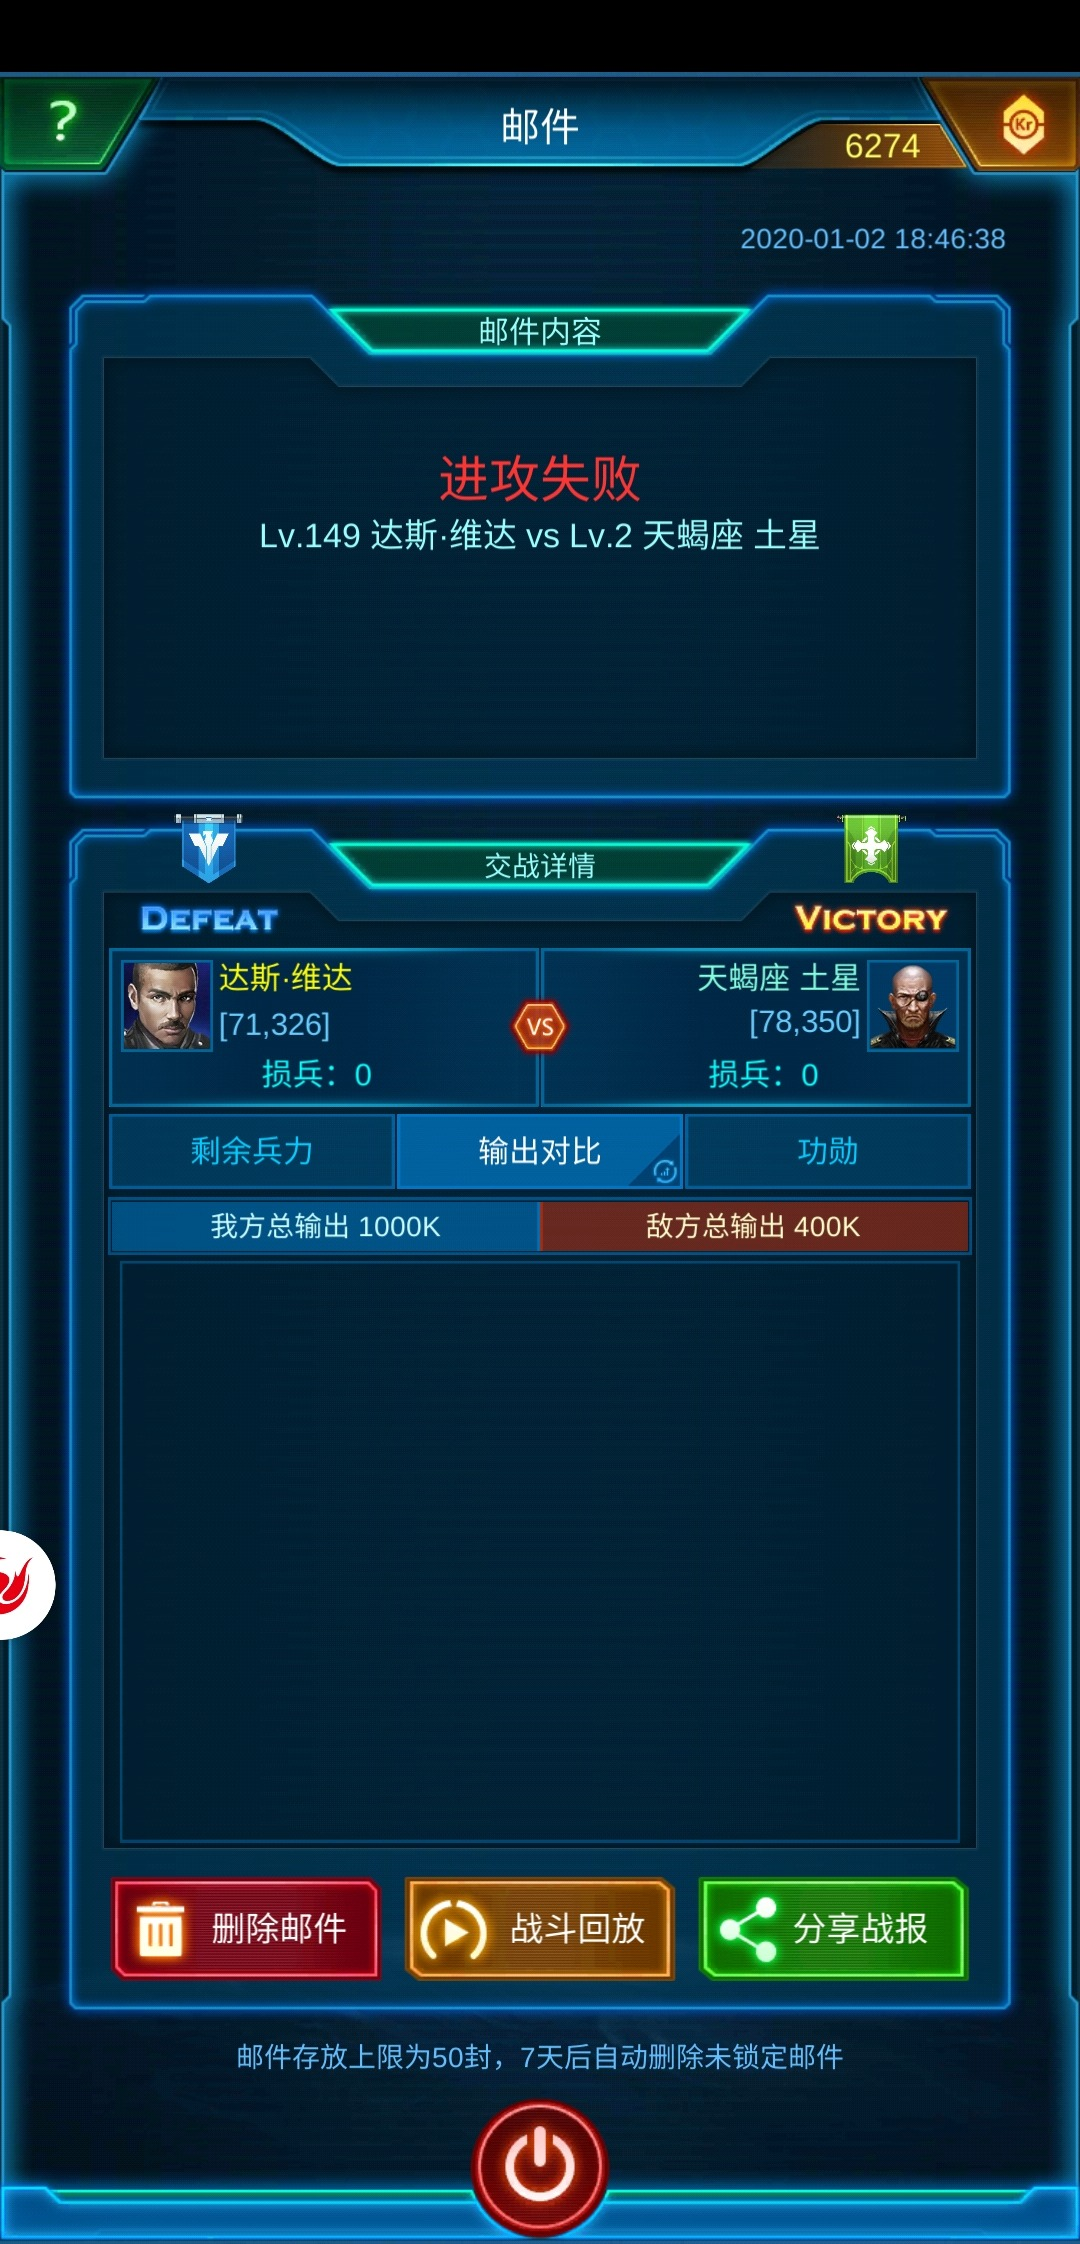 Screenshot_20200102_184828_com.jedigames.p16s.luobo.jpg